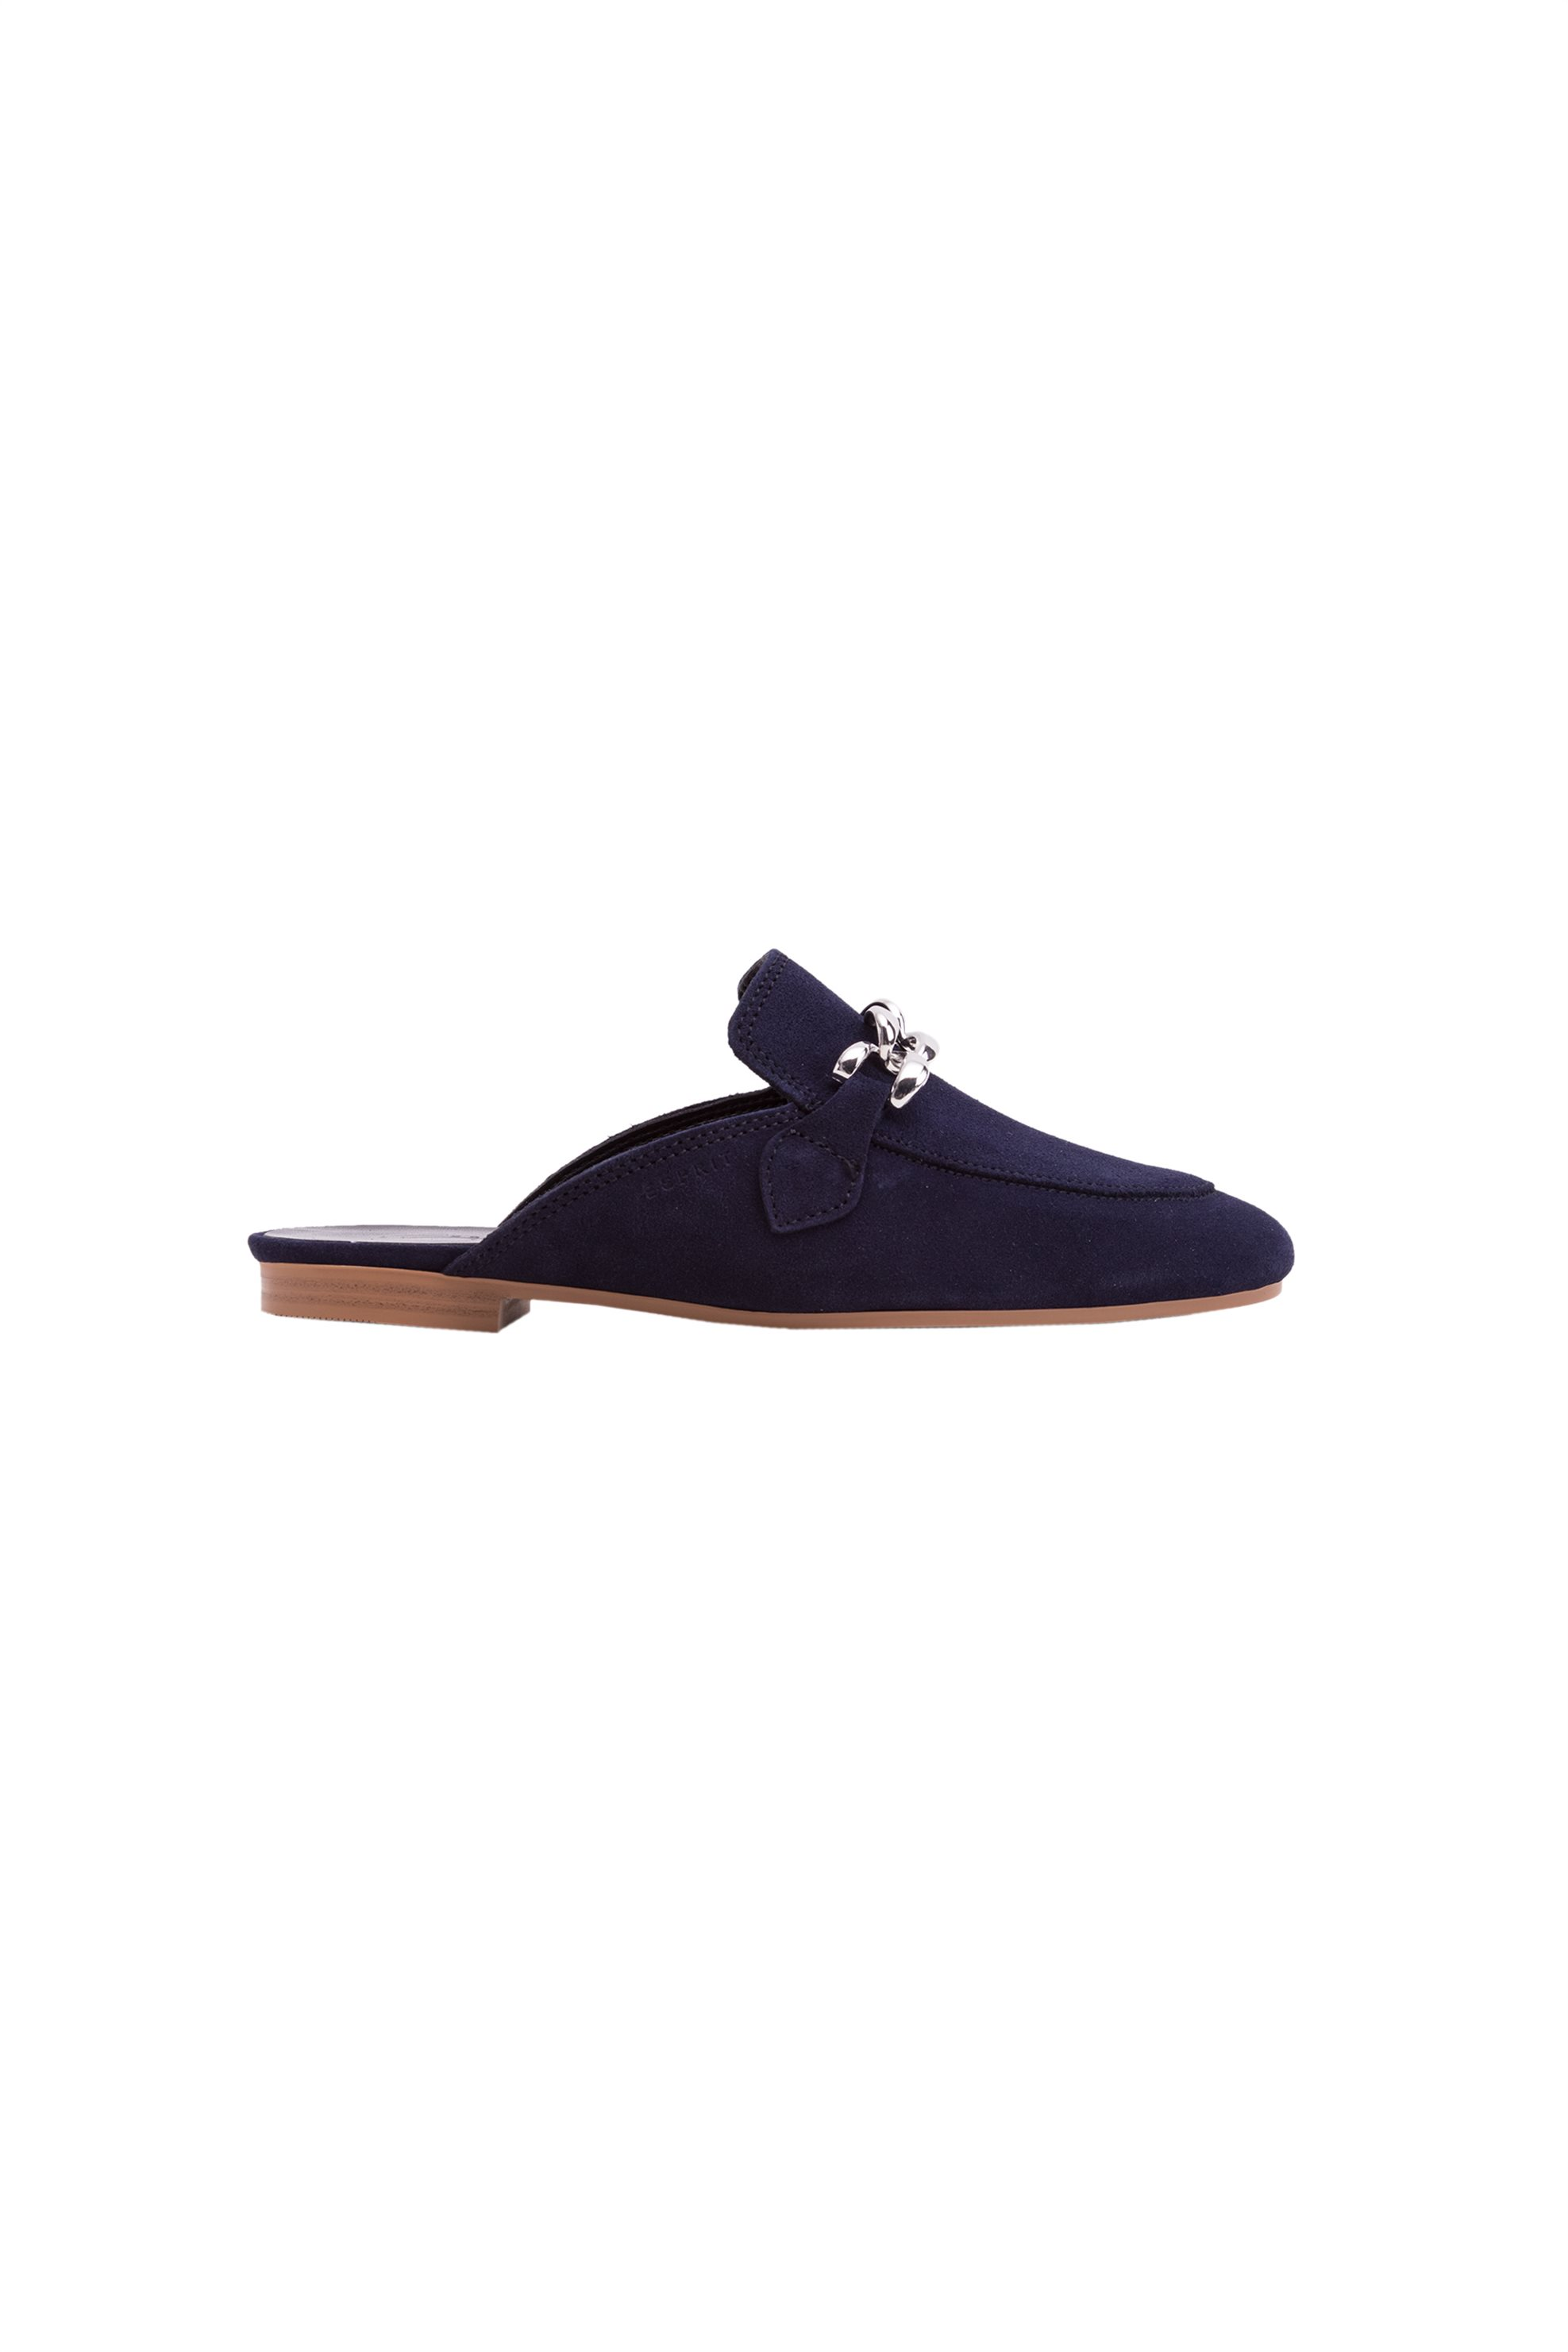 c758029407a Notos Γυναικεία δερμάτινα παπούτσια Esprit – 038EK1W018